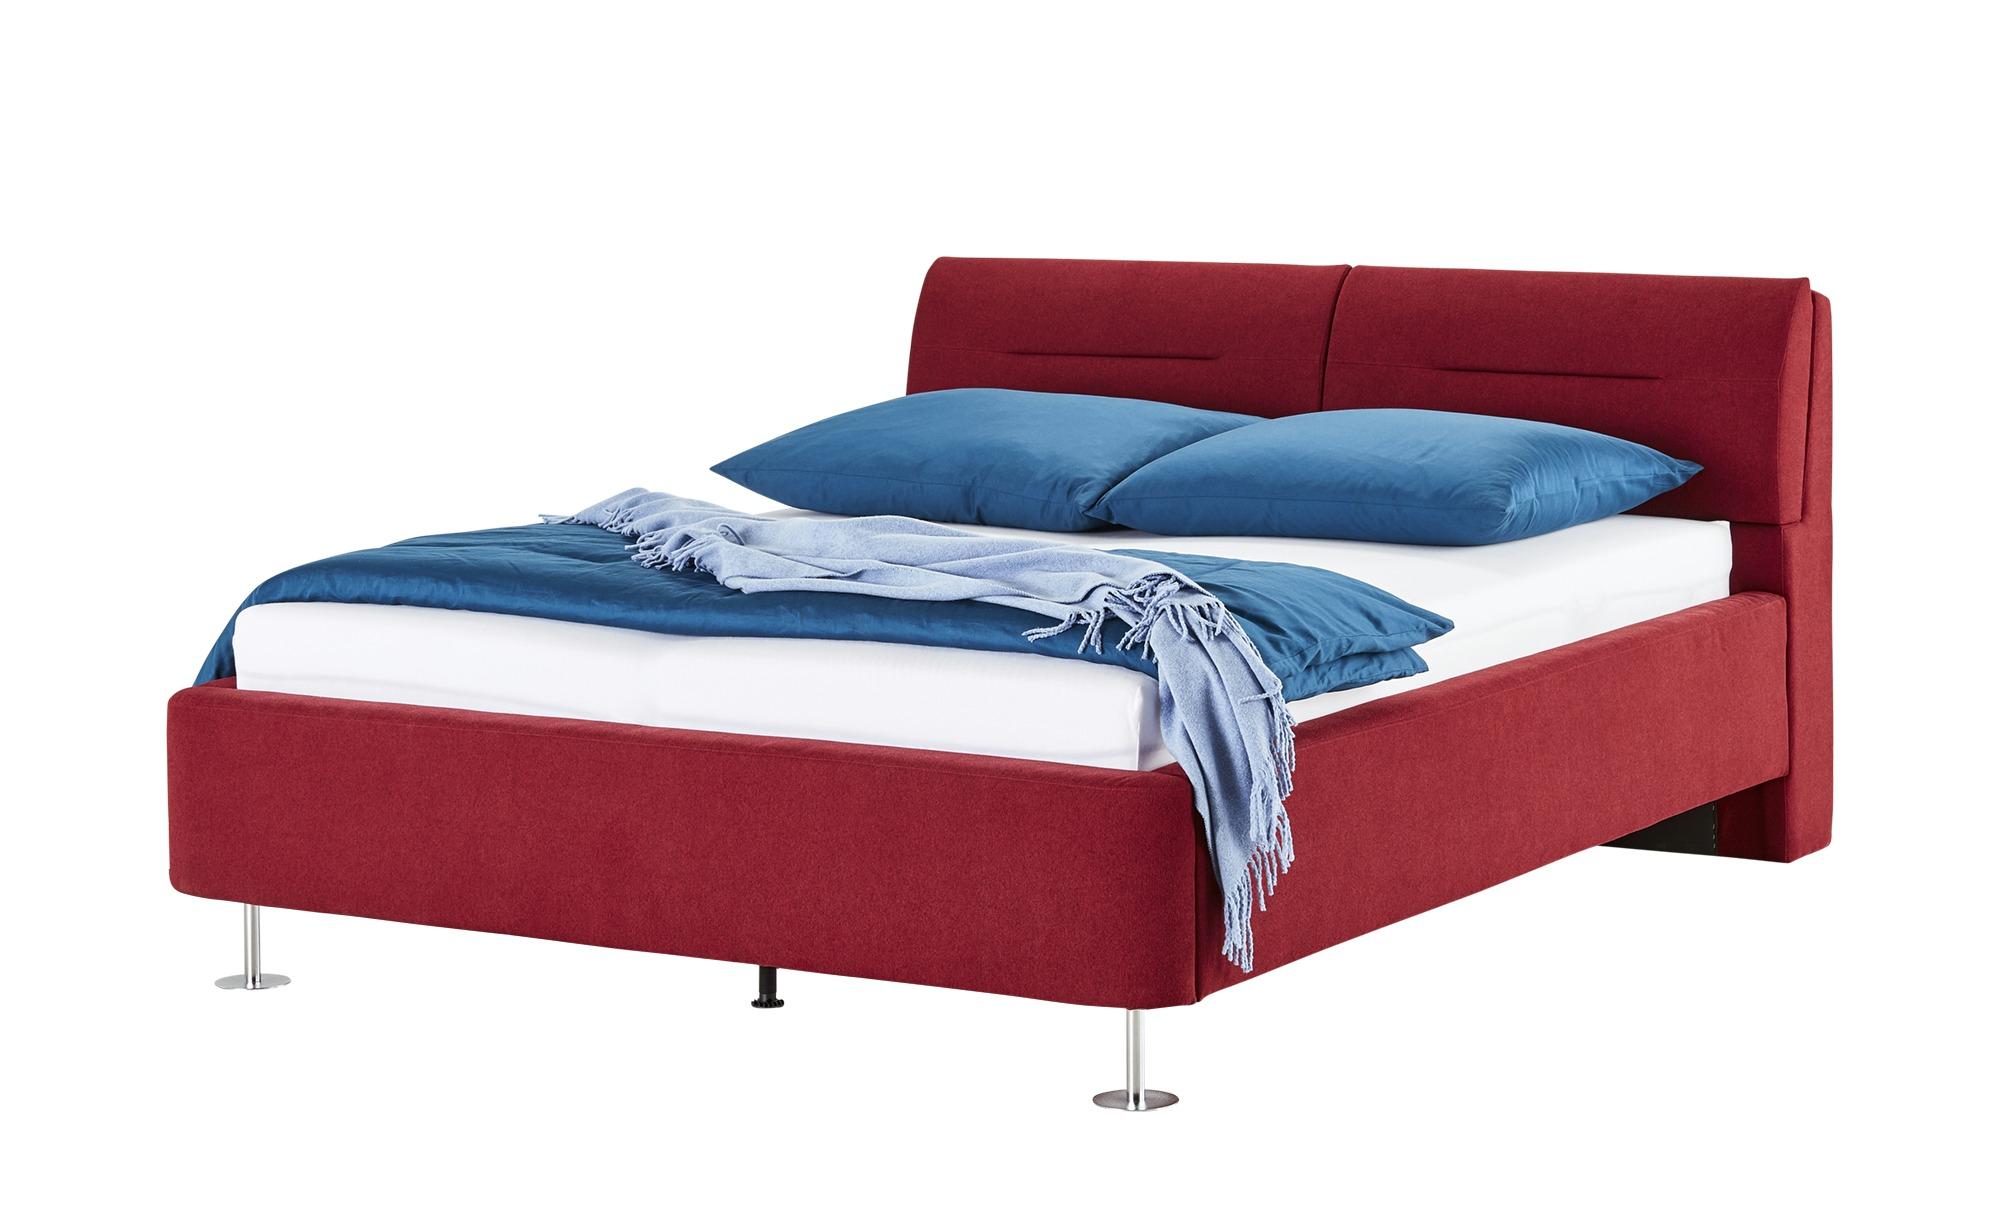 Polsterbettgestell 160x200 - rot Mein Bett ¦ rot ¦ Maße (cm): B: 179 H: 100 T: 230 Betten > Polsterbetten - Höffner